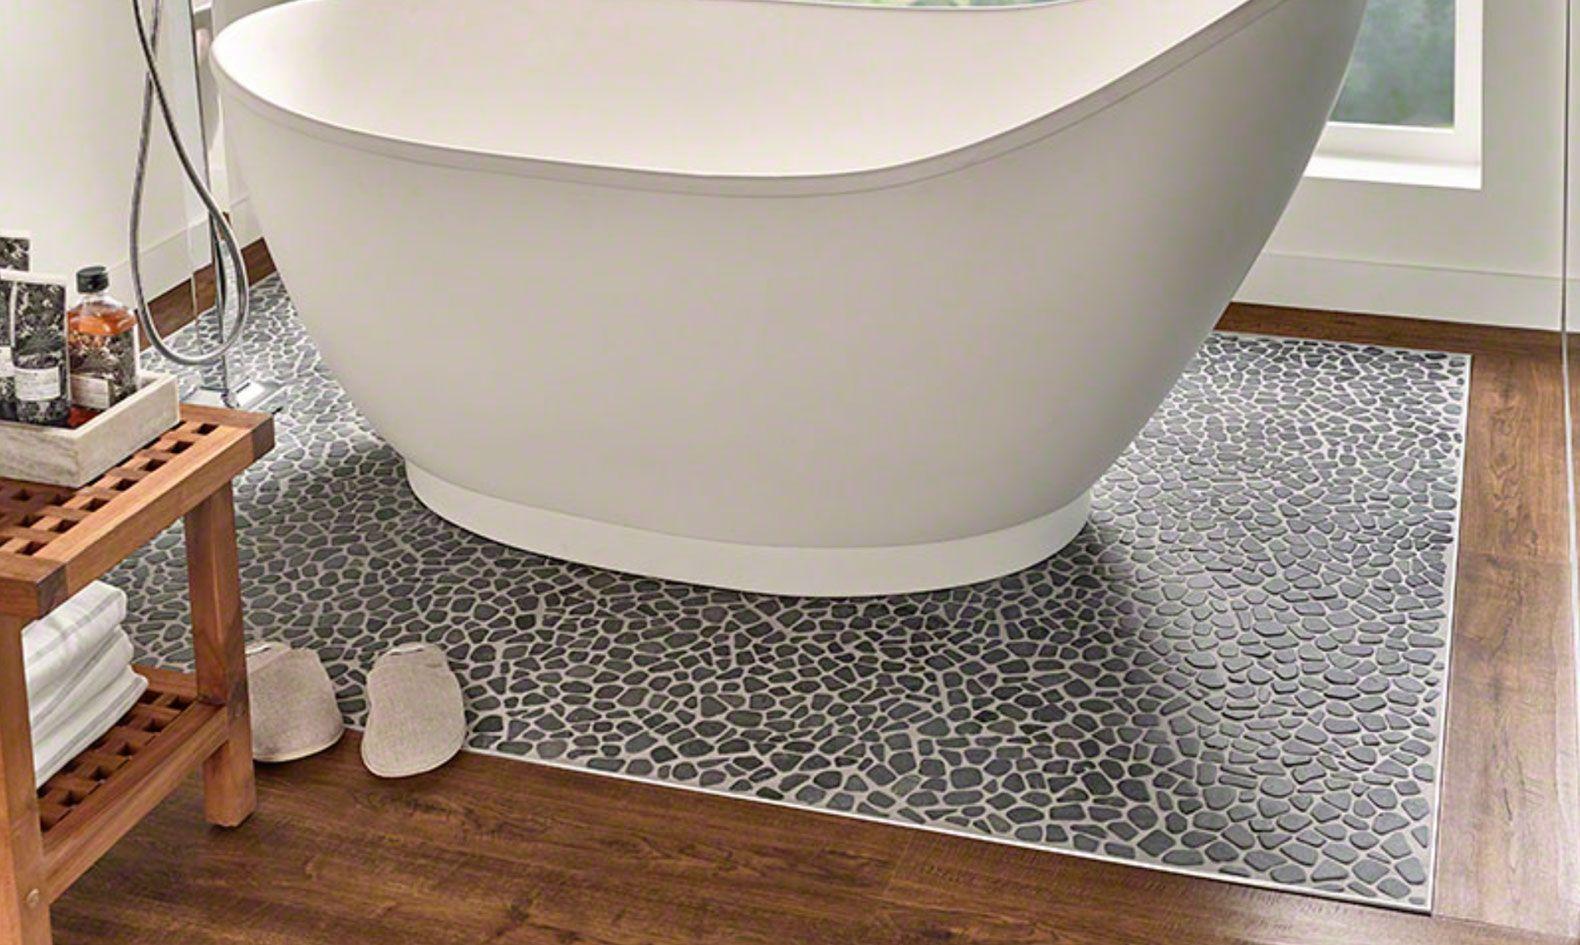 Image result for freestanding tub on pebble tile Free